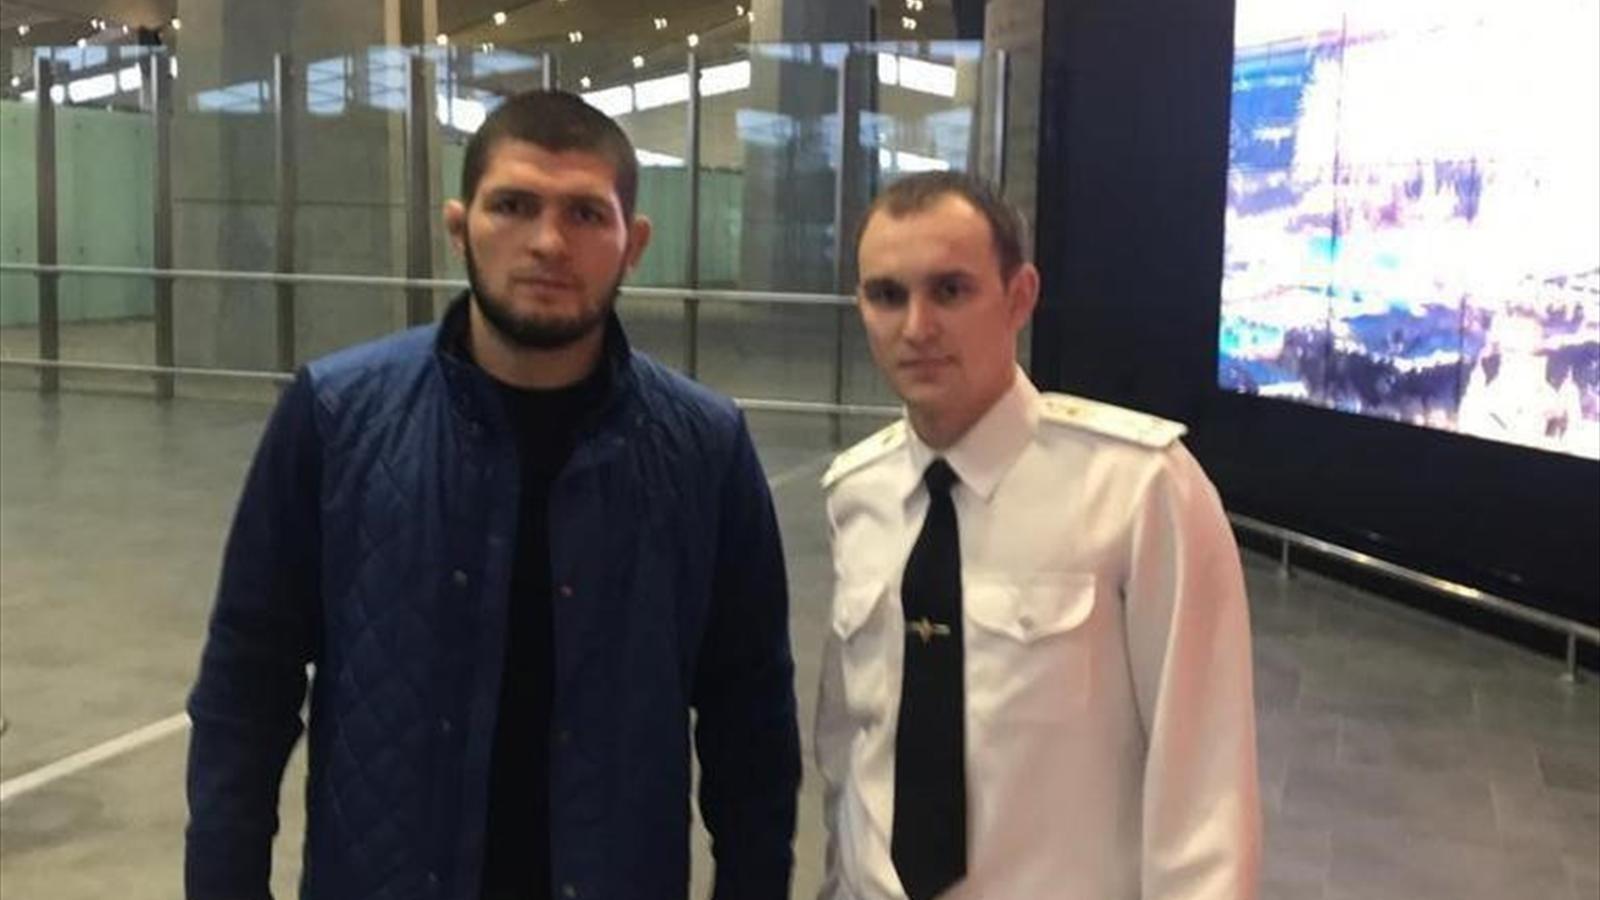 Нурмагомедова задержали в аэропорту, перепутав его с террористом